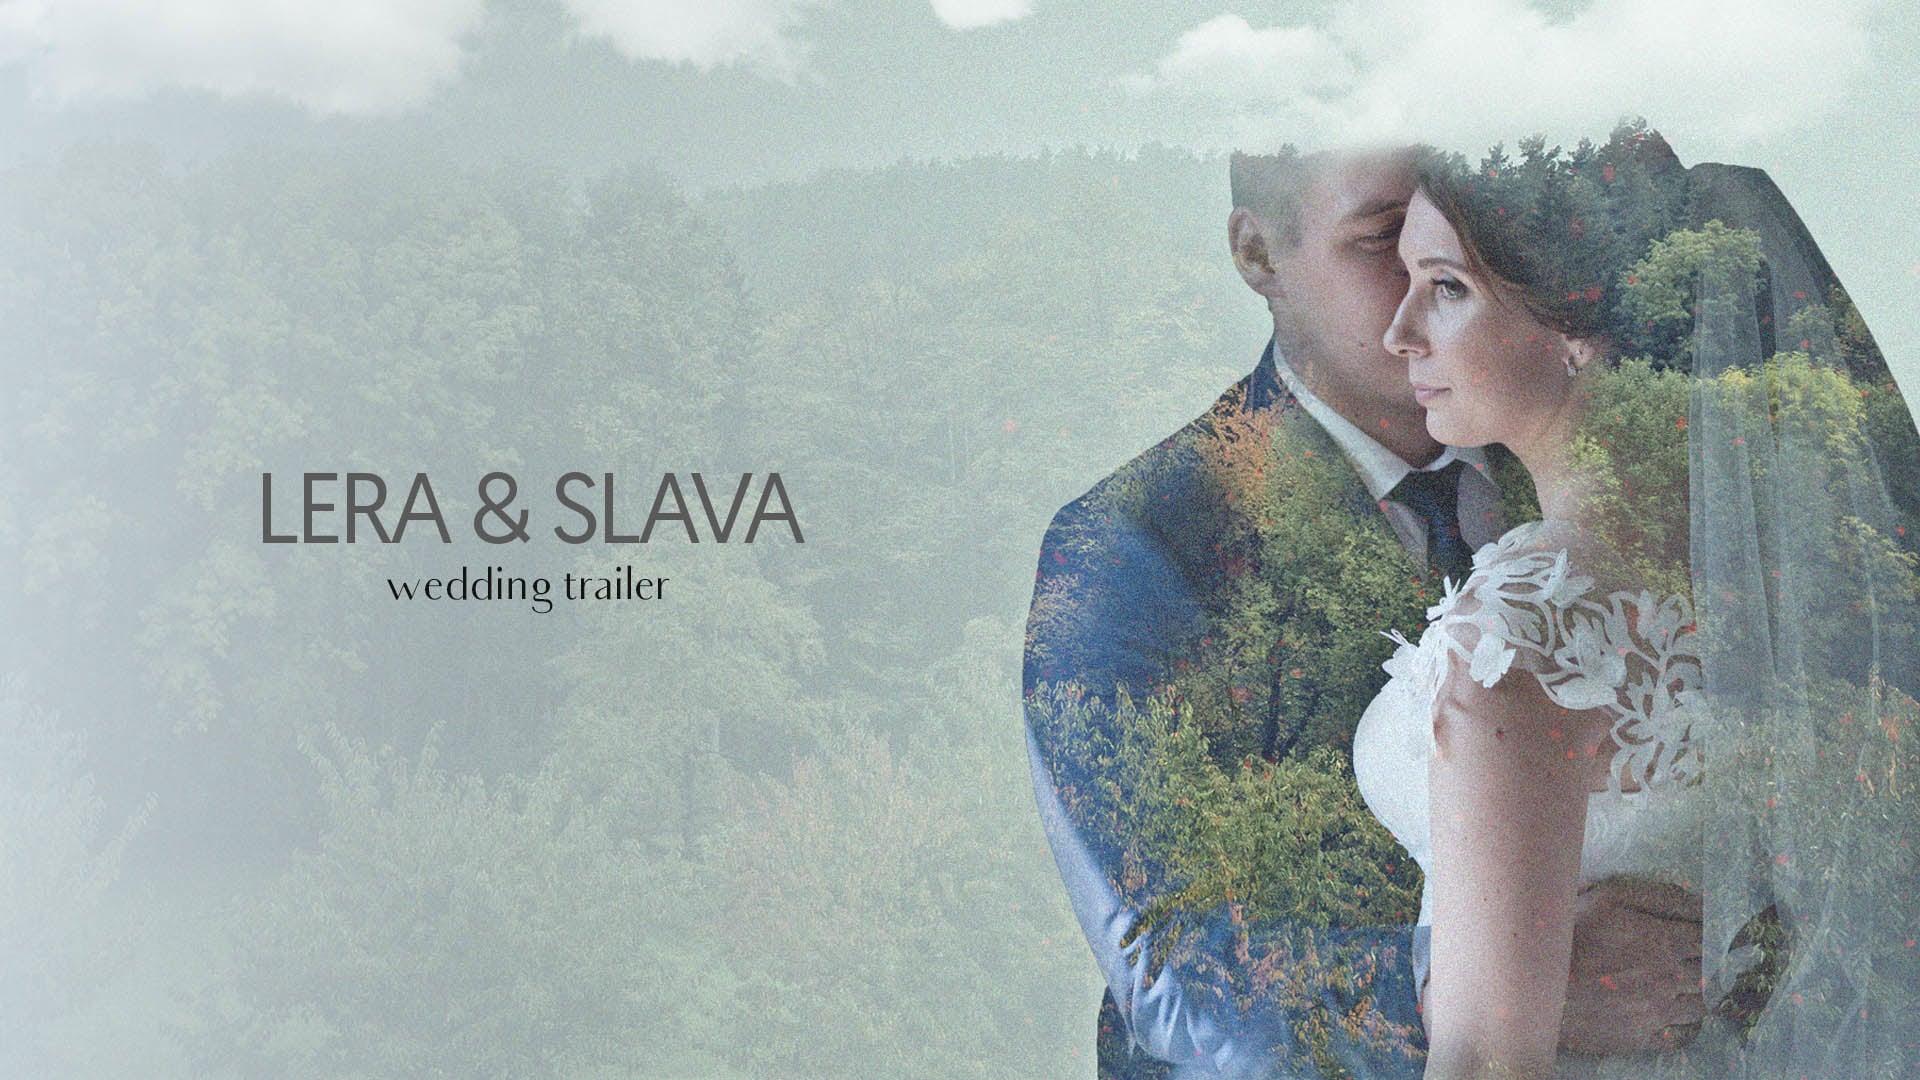 Lera & Slava - Wedding Trailer [Moscow - Russia]